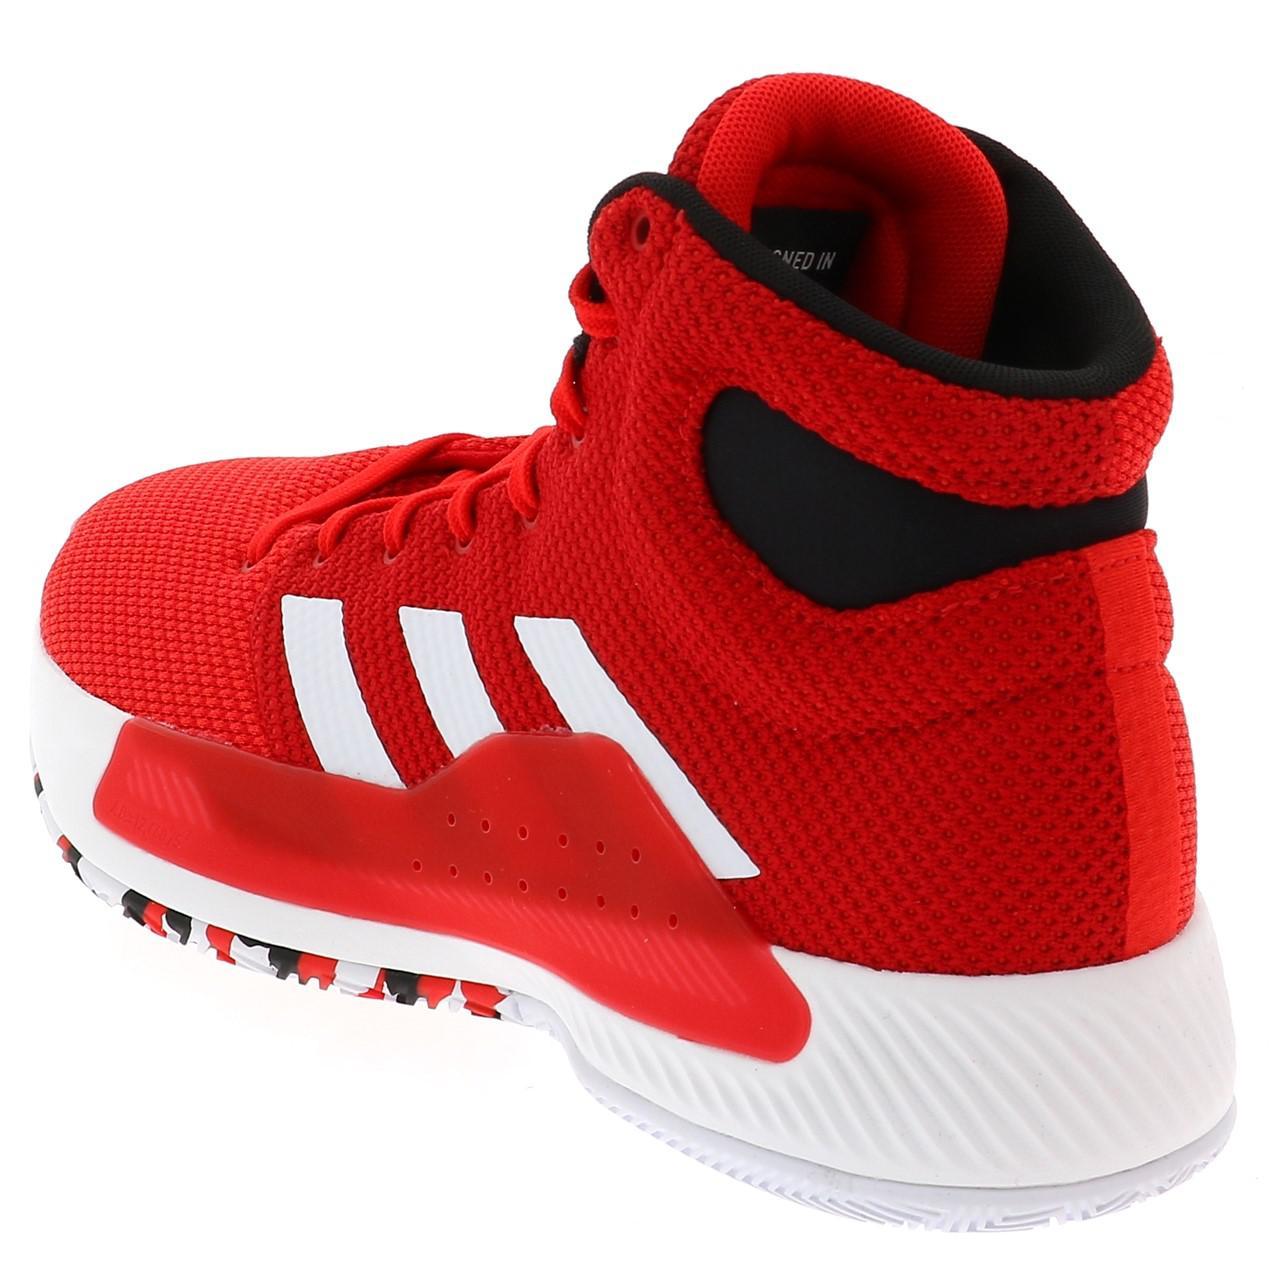 Chaussures-basket-Adidas-Pro-bounce-madness-basket-Rouge-55000-Neuf miniature 3